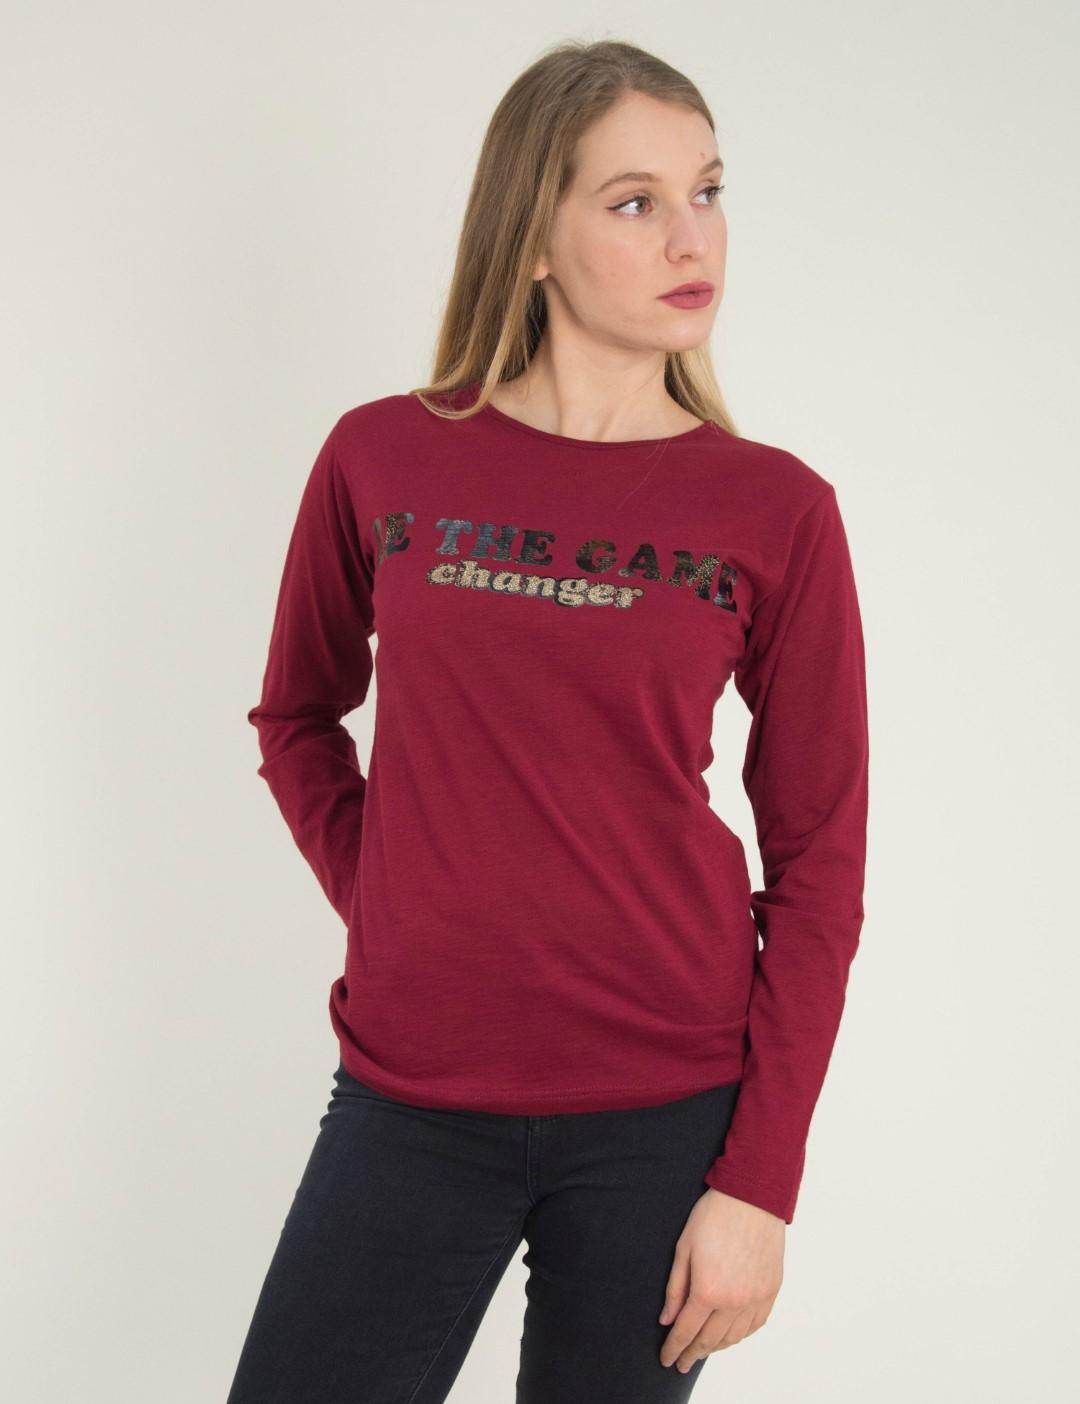 2132565bec90 Γυναικεία μπορντό μακρυμάνικη μπλούζα τύπωμα 1175954C